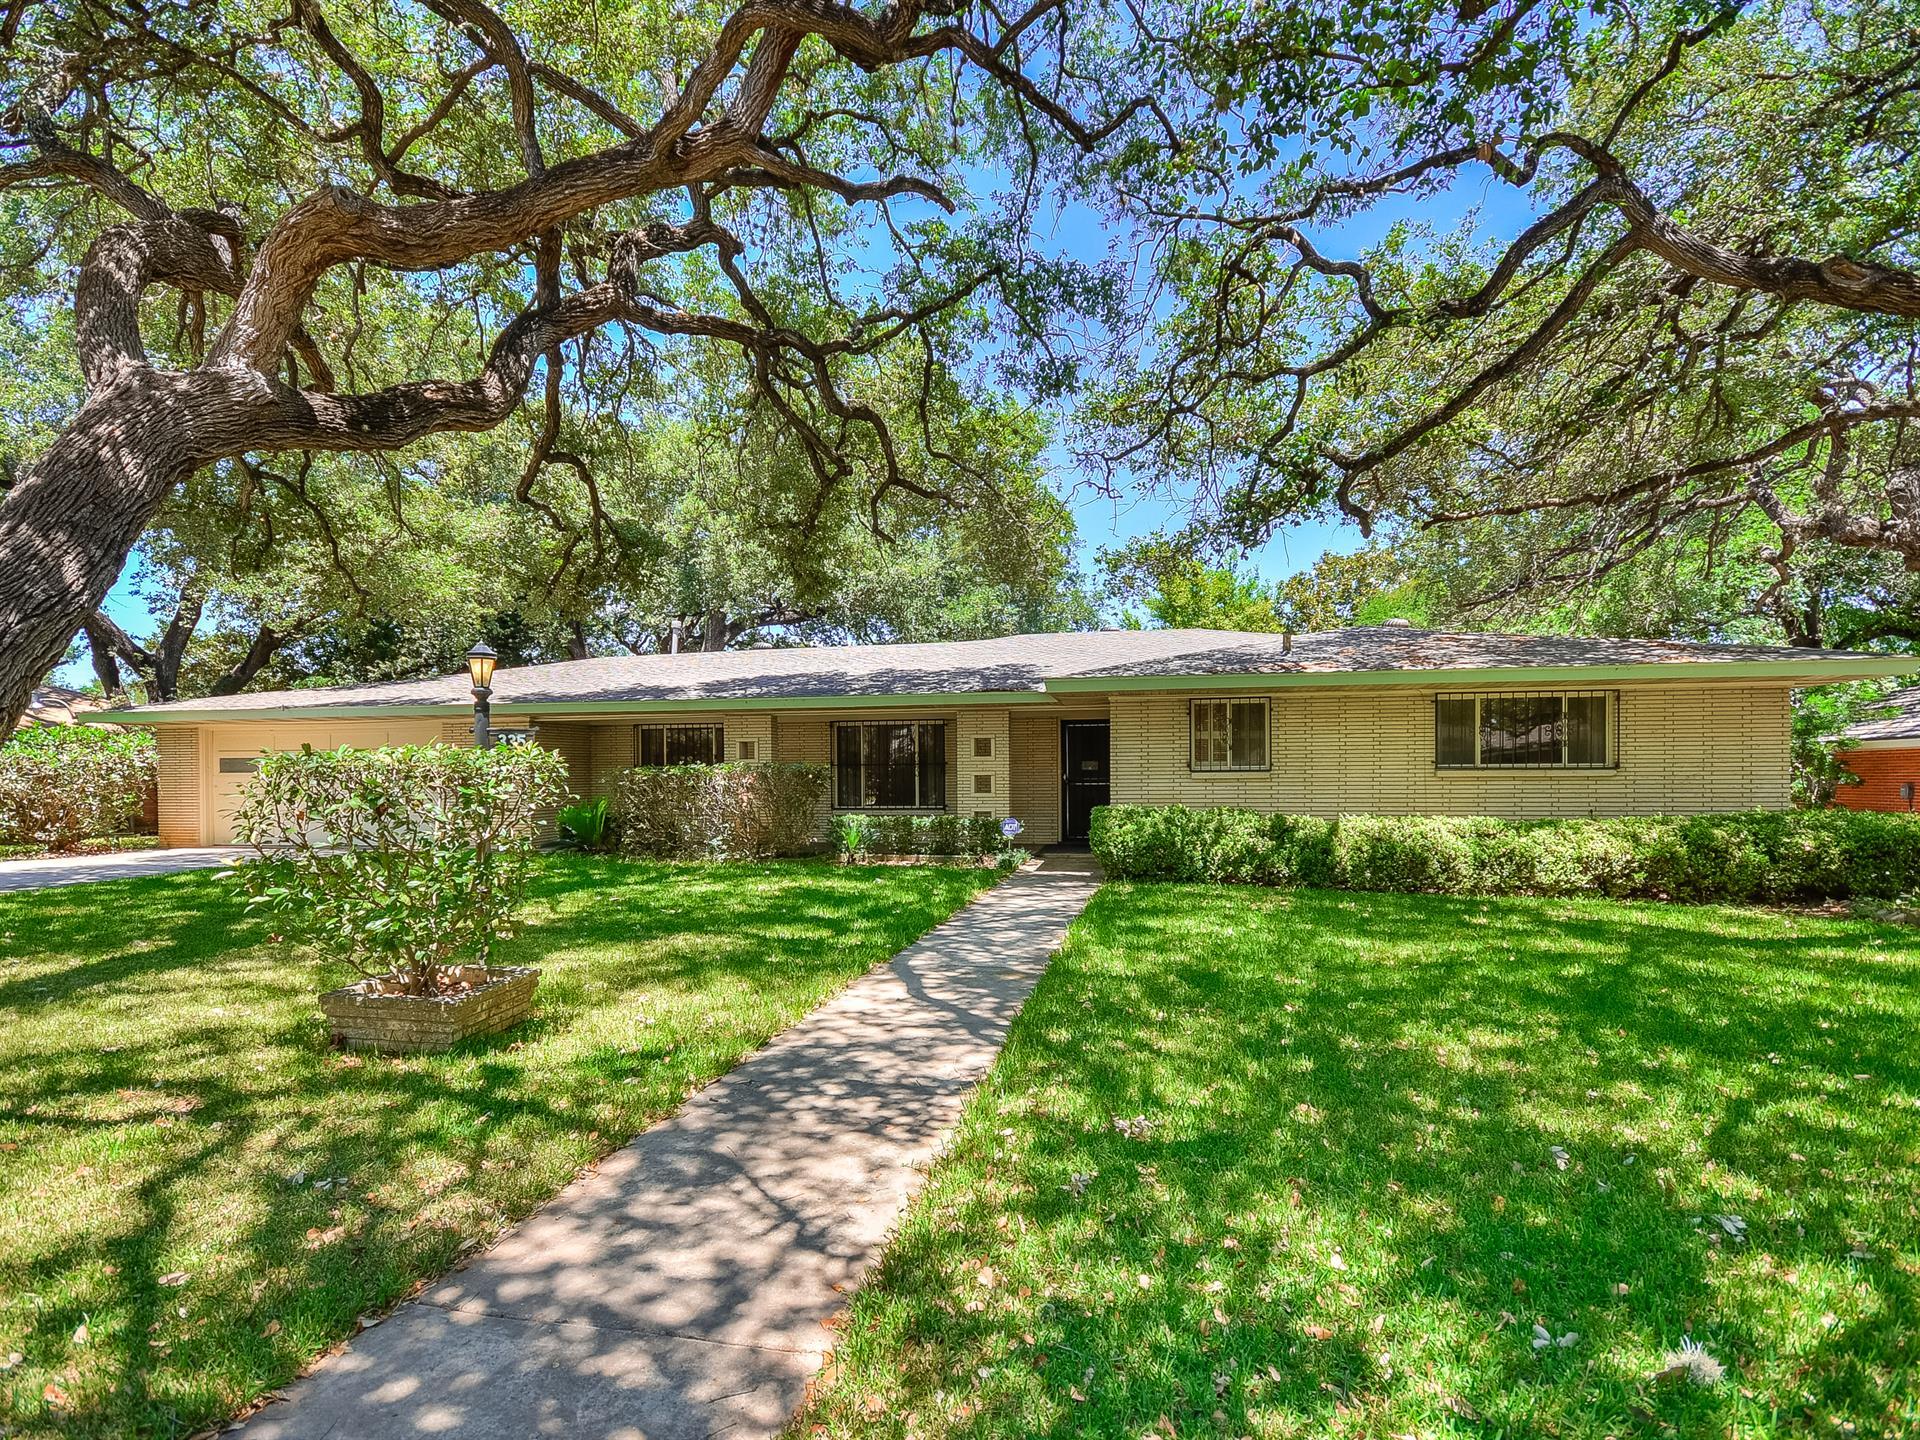 House for Sale at 335 Royal Oaks 335 Royal Oaks San Antonio, Texas 78209 United States